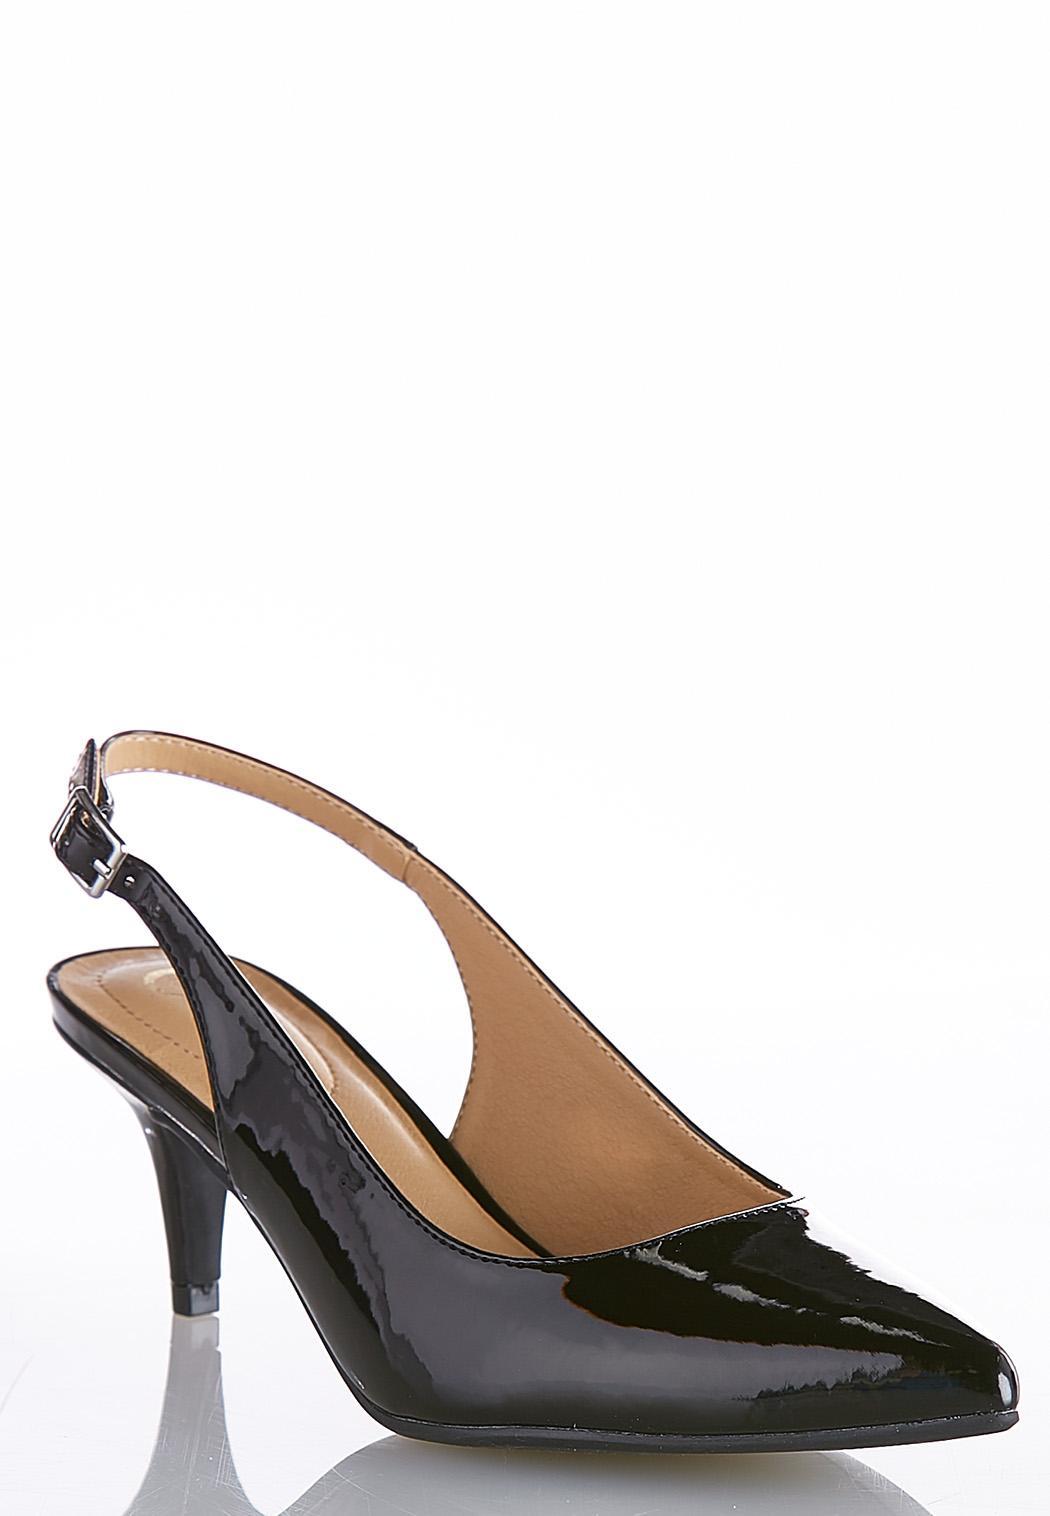 24deb82cbe5 Wide Width Patent Slingback Pumps Heels Cato Fashions